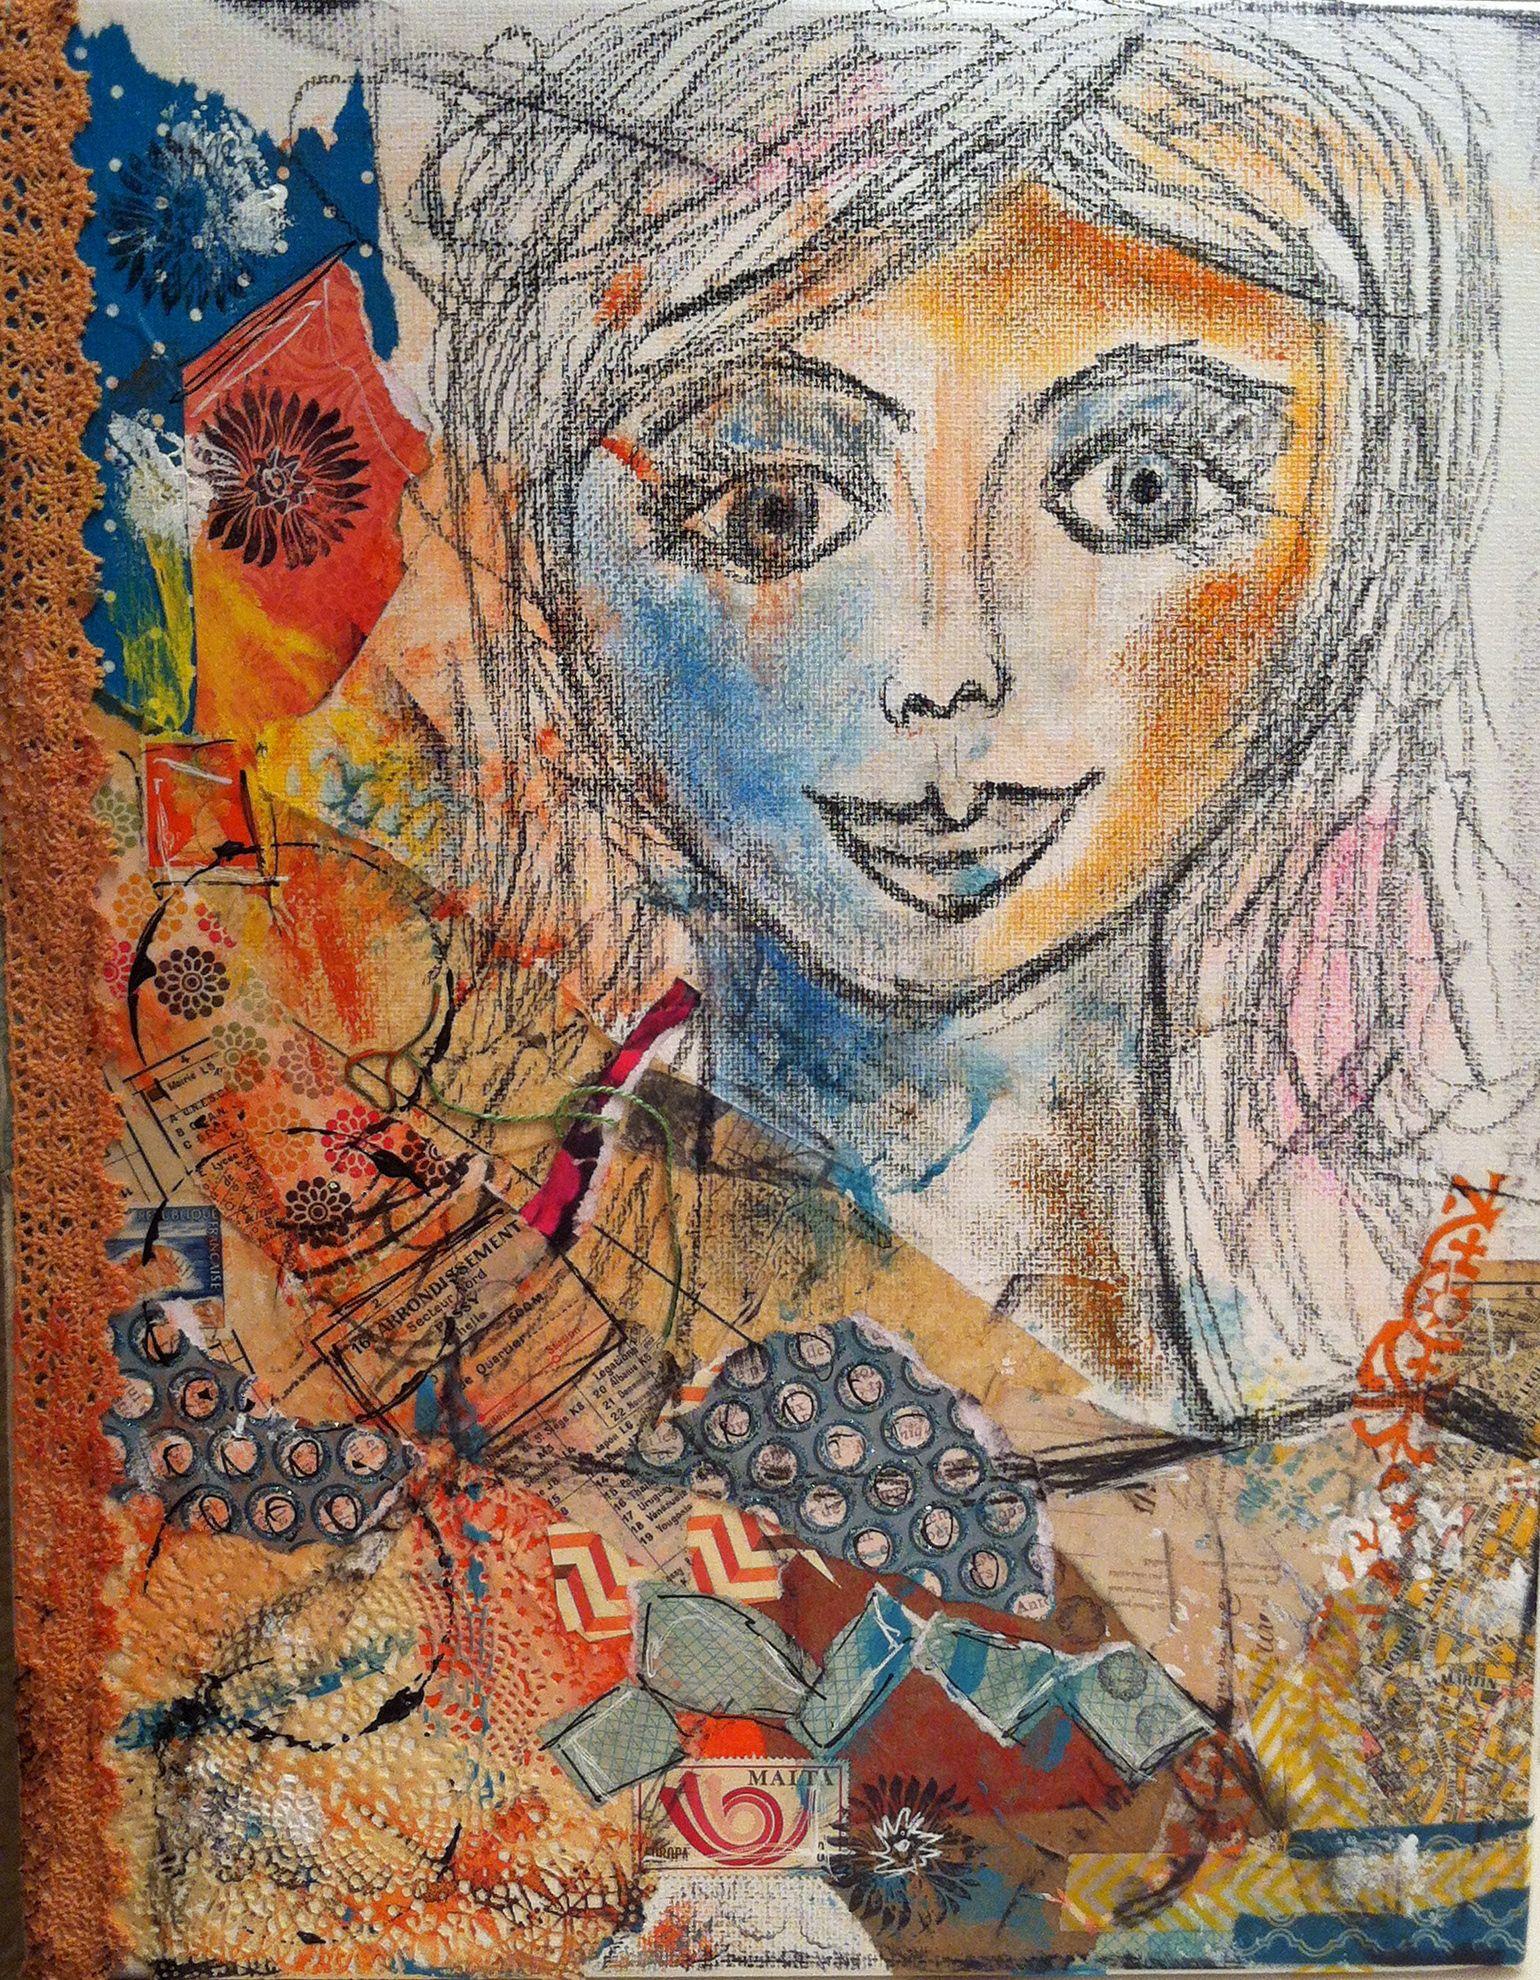 Mixed media on canvas ... girl